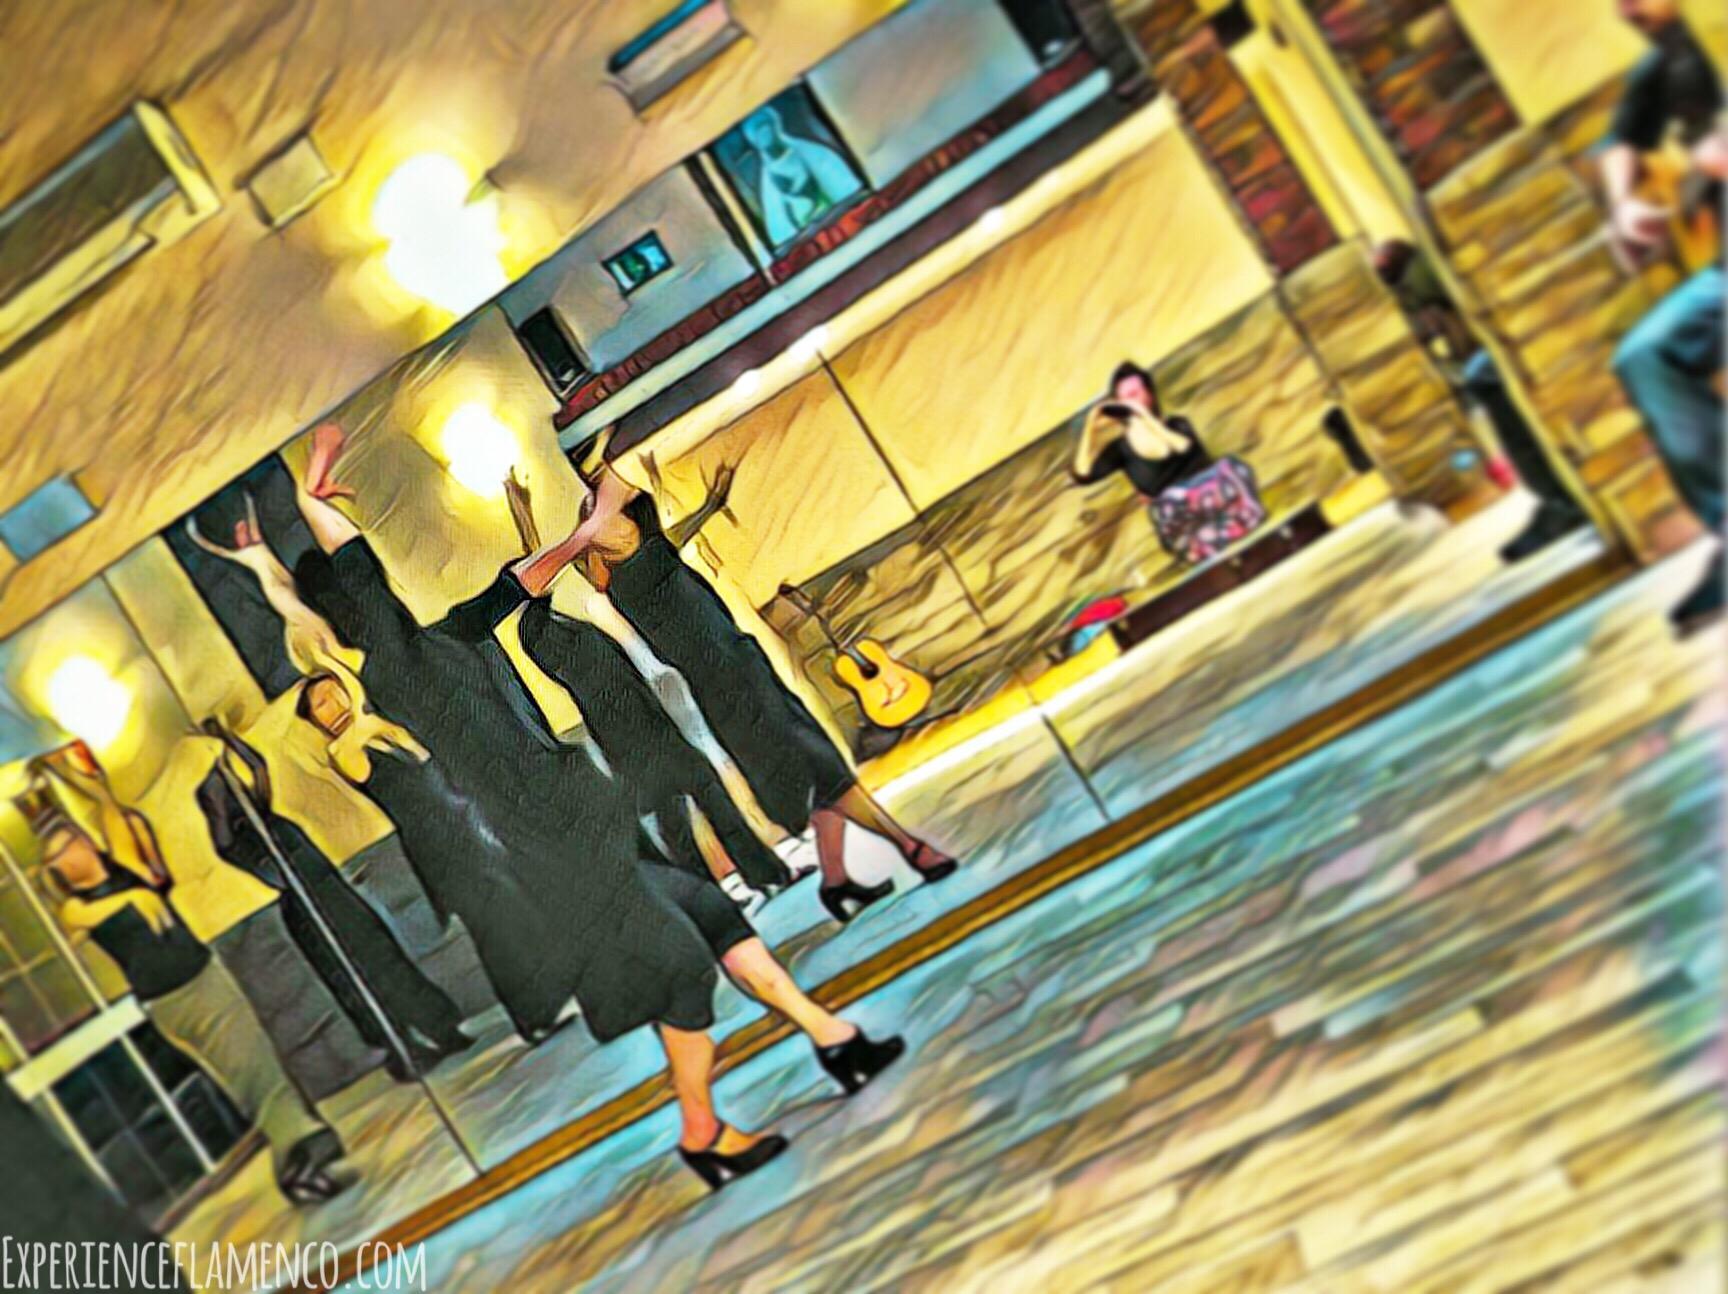 TIP 9: DANCE